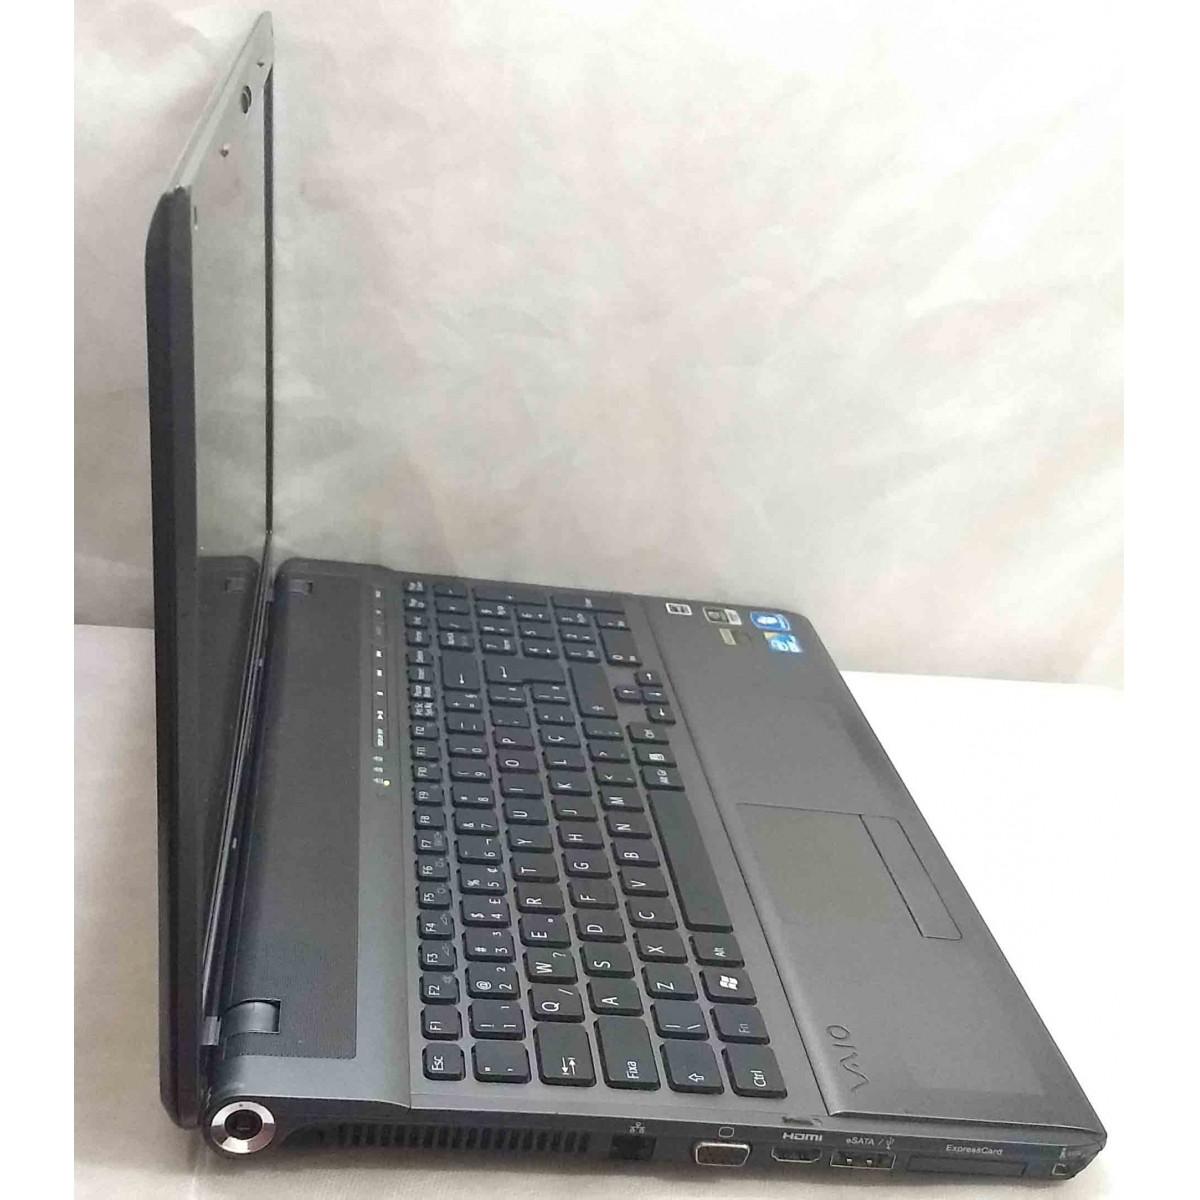 Notebook Sony Vaio VPC-F111FB 16.4'' Core i5 2.6GHz 6GB HD-320GB Alphanumérico|Dedicada